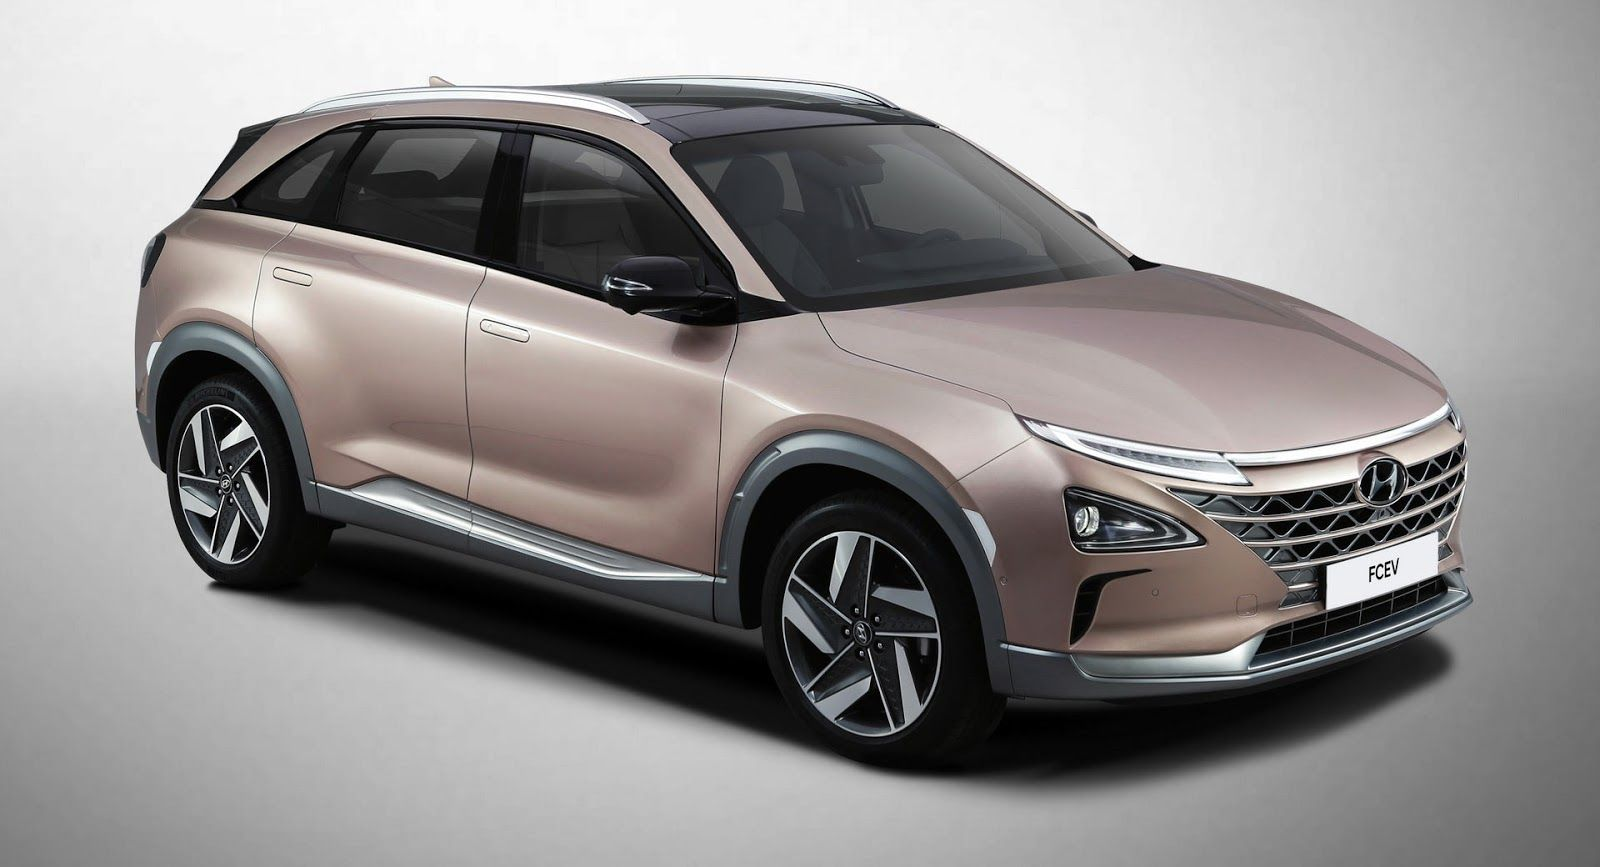 Hyundai's NextGen FCEV To Debut New Autonomous Systems